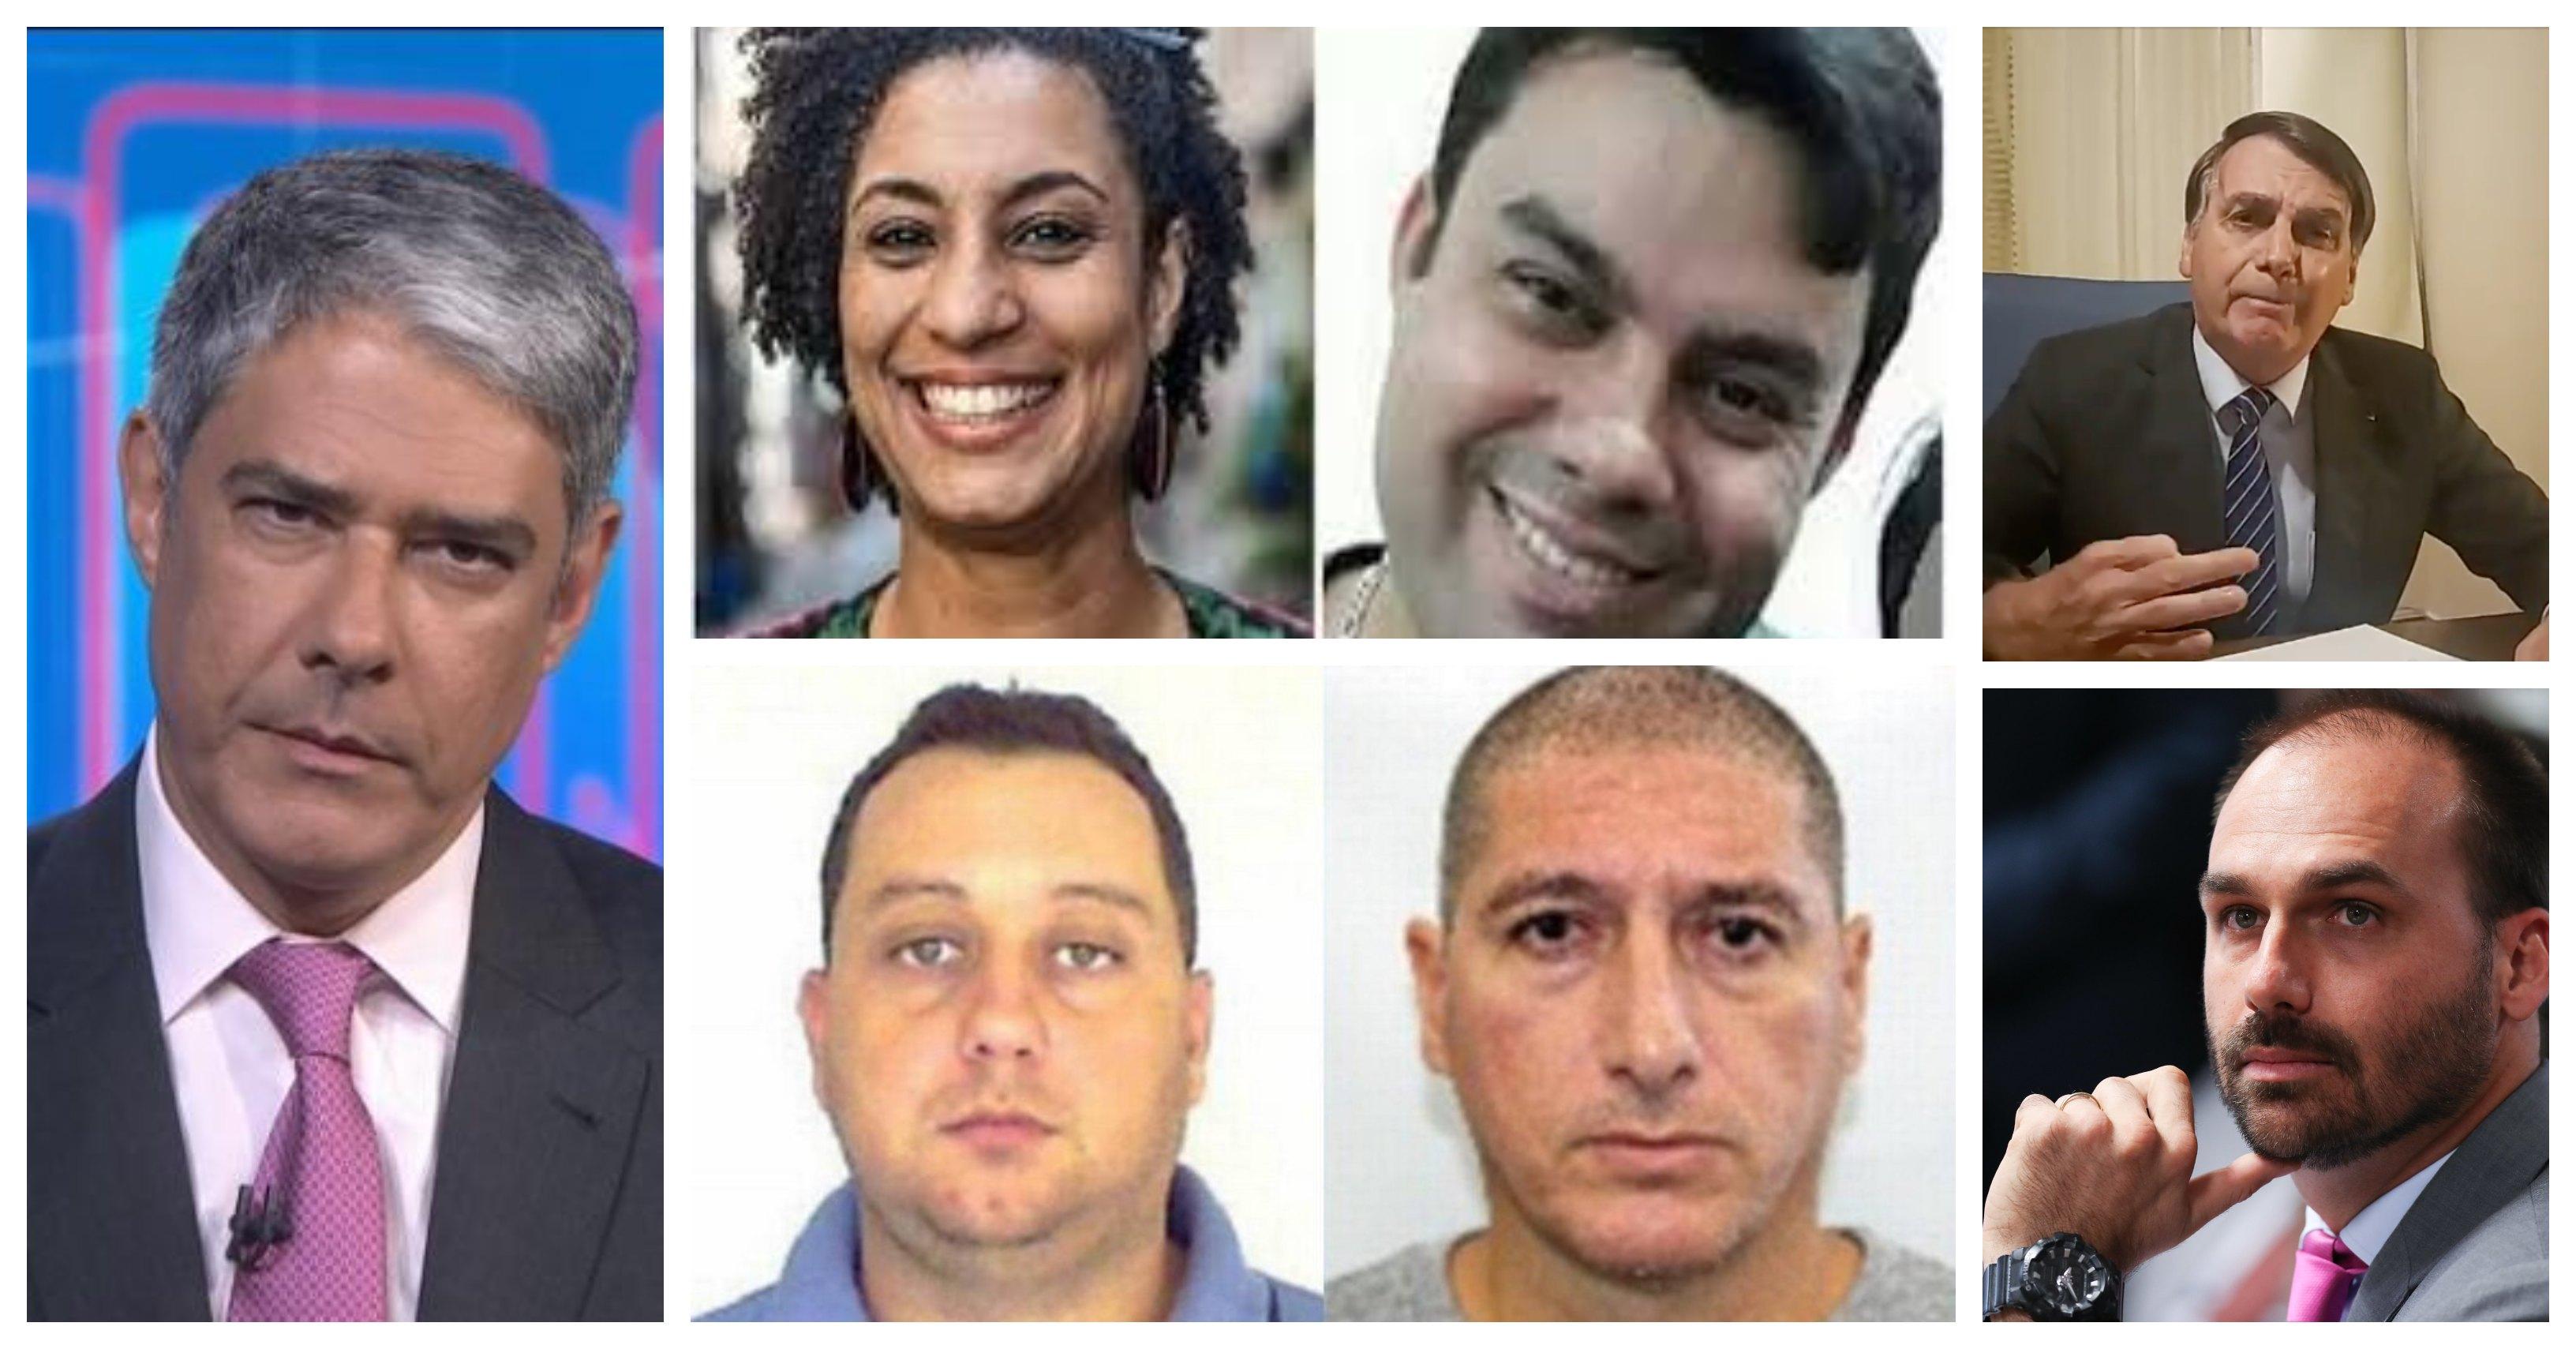 Eliara Santana: Globo x Bolsonaros, leões e hienas e o Brasil à deriva. O que vem por aí?